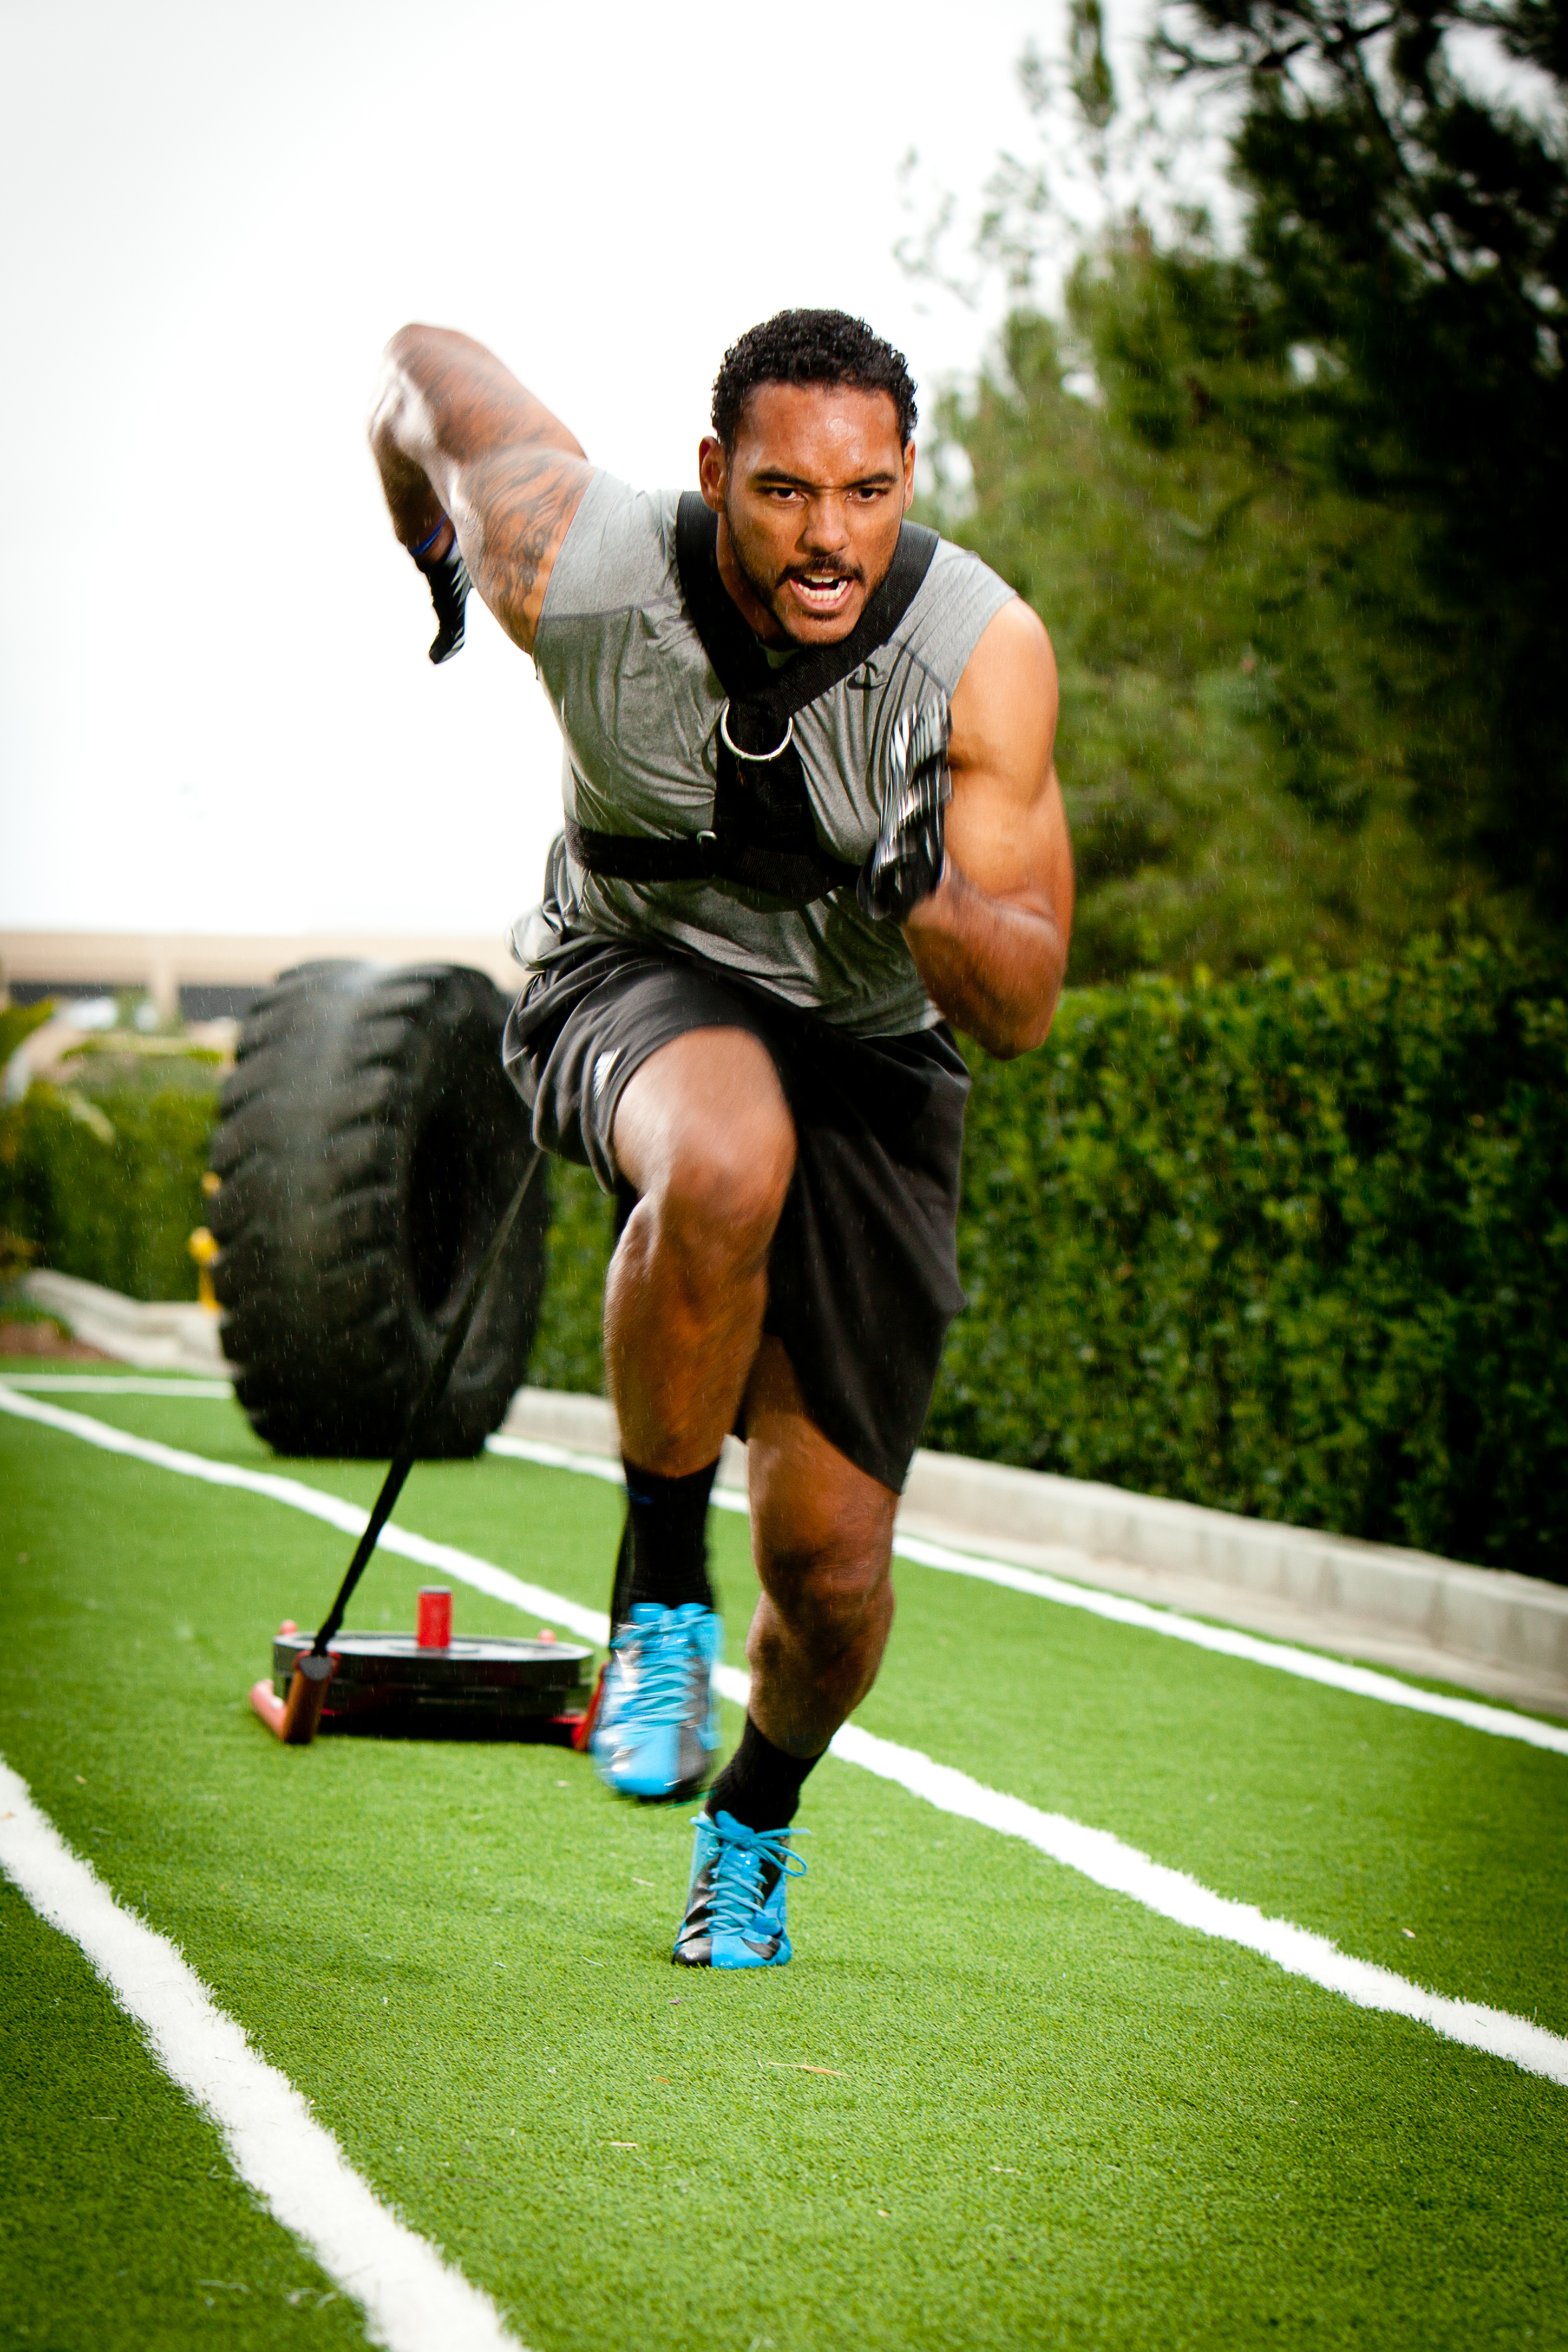 Sports Performance Training - SKPT Fitness: Speed Kills ...